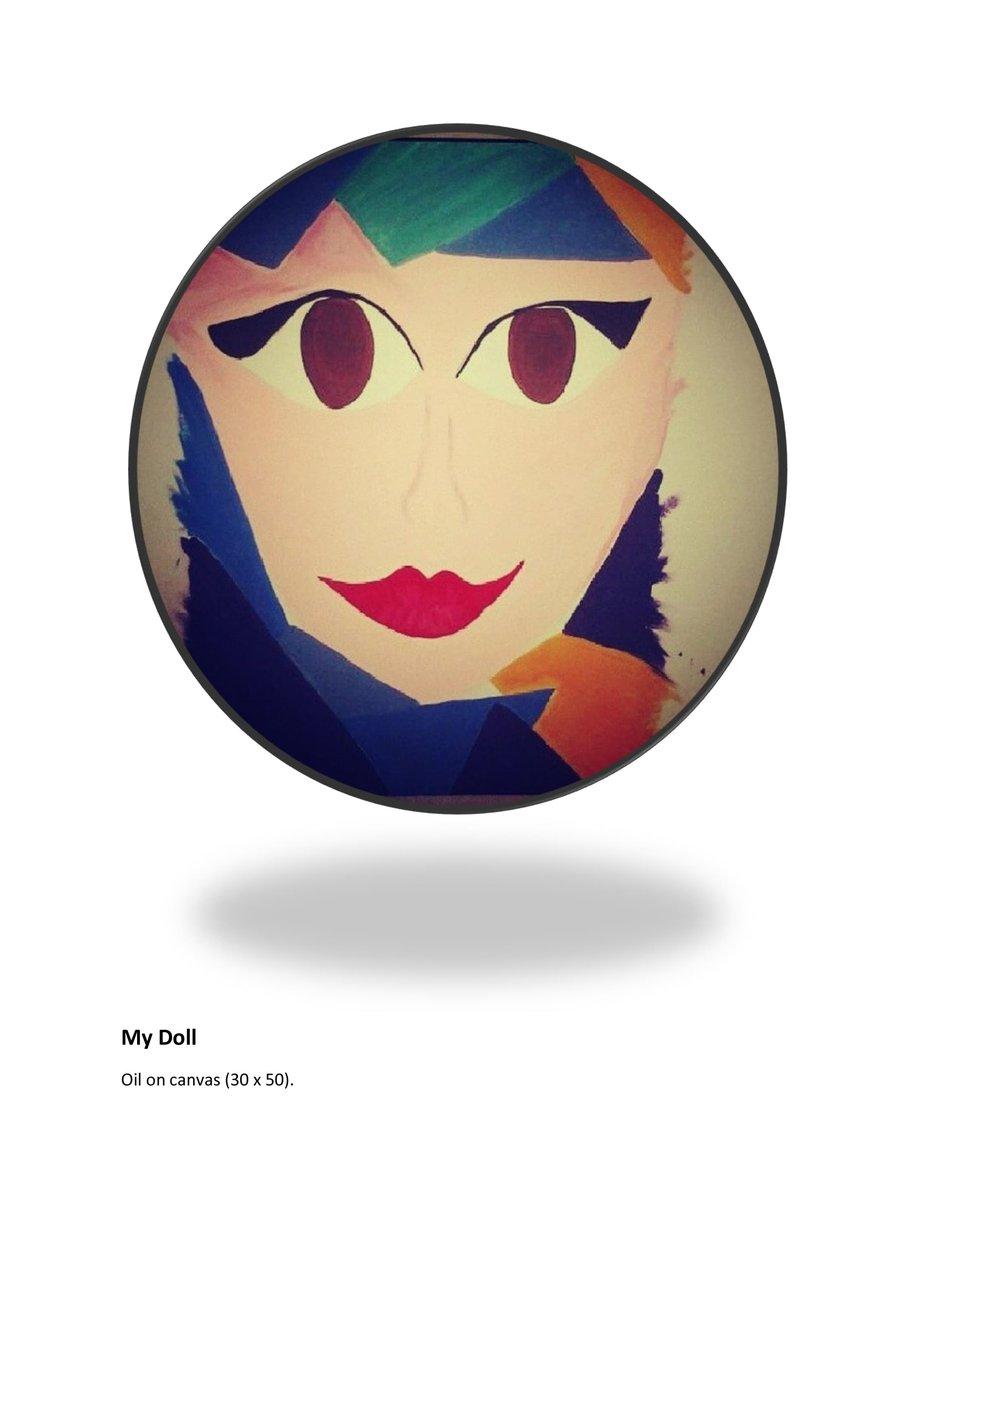 art-portfolio-aglae-corrected-14-min.jpg